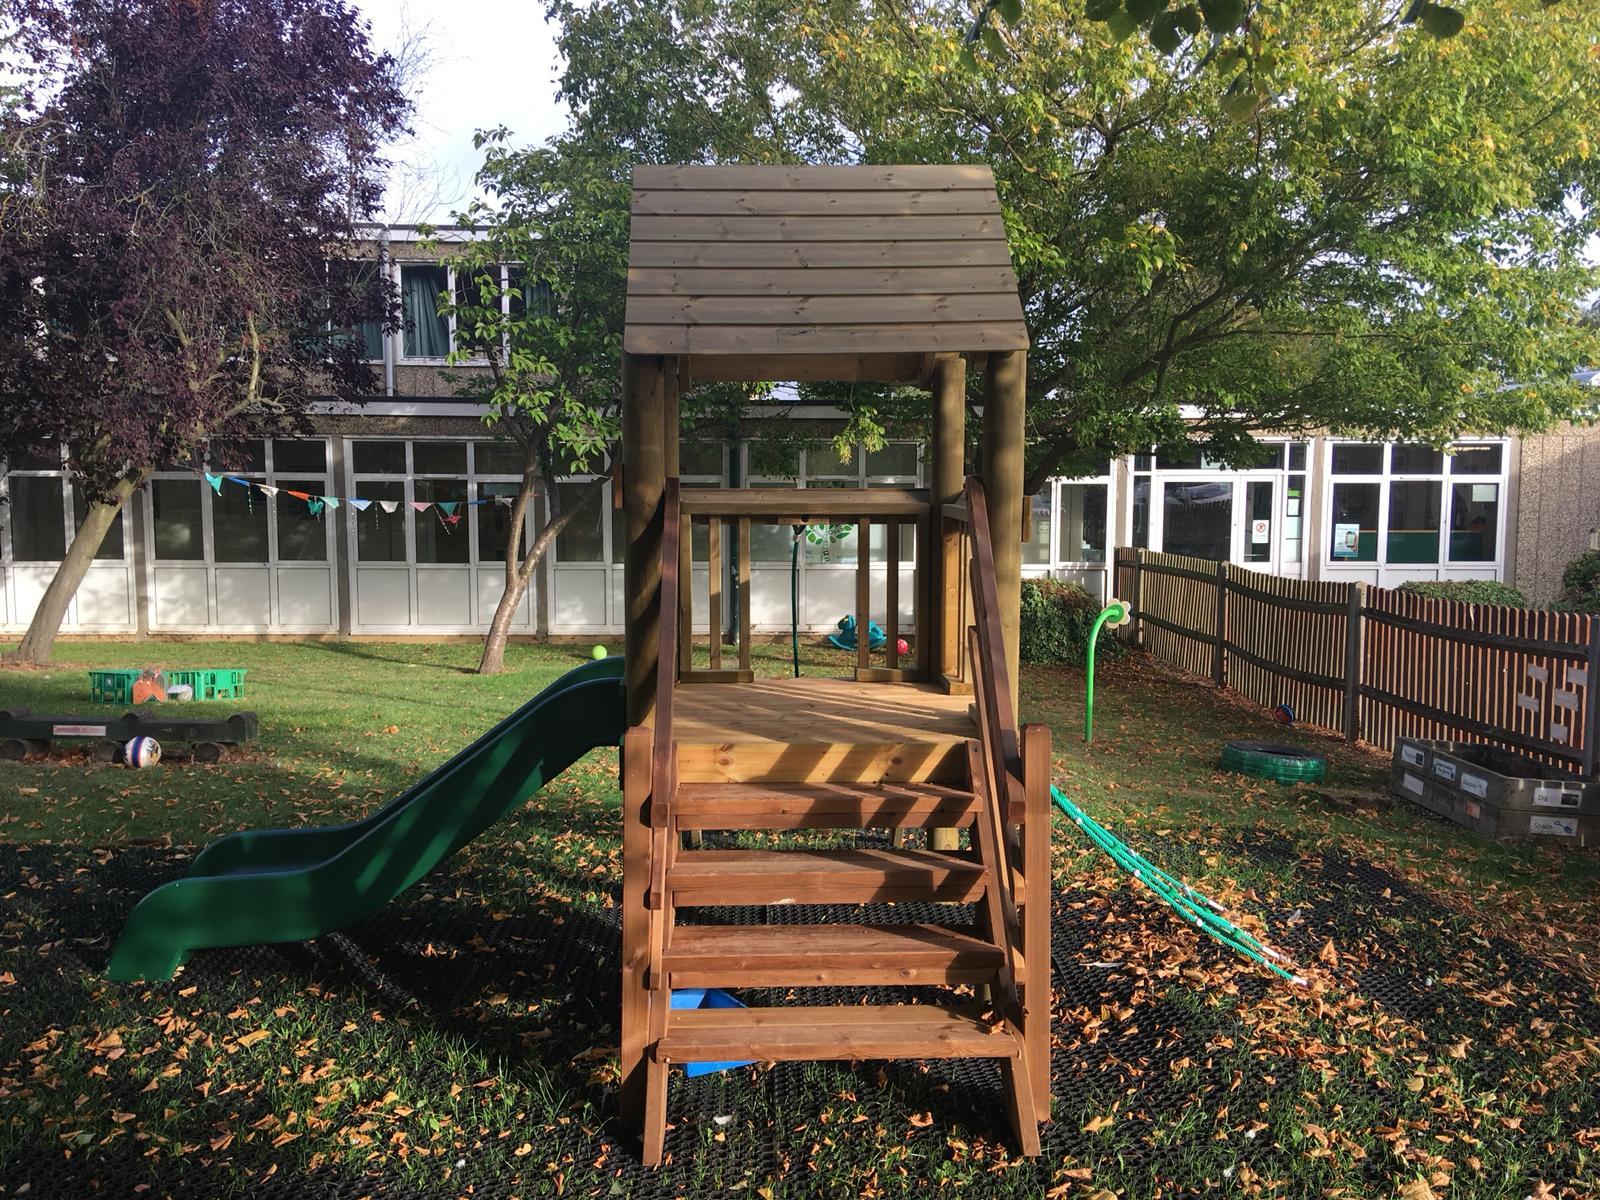 Strathmore Preschool New climbing frame side